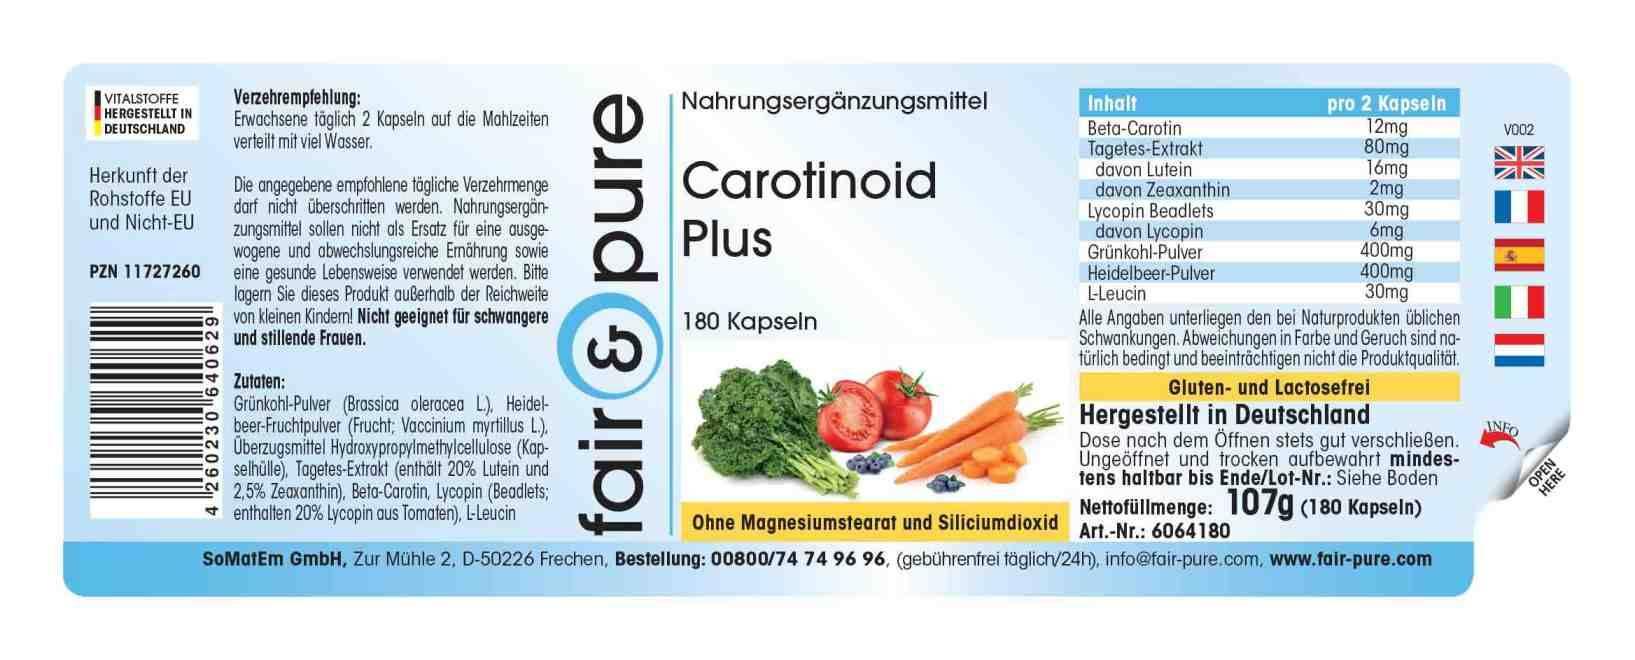 Caroténoïde Plus avec bêta-carotène, lutéine, zéaxanthine, zéaxanthine, lycopène